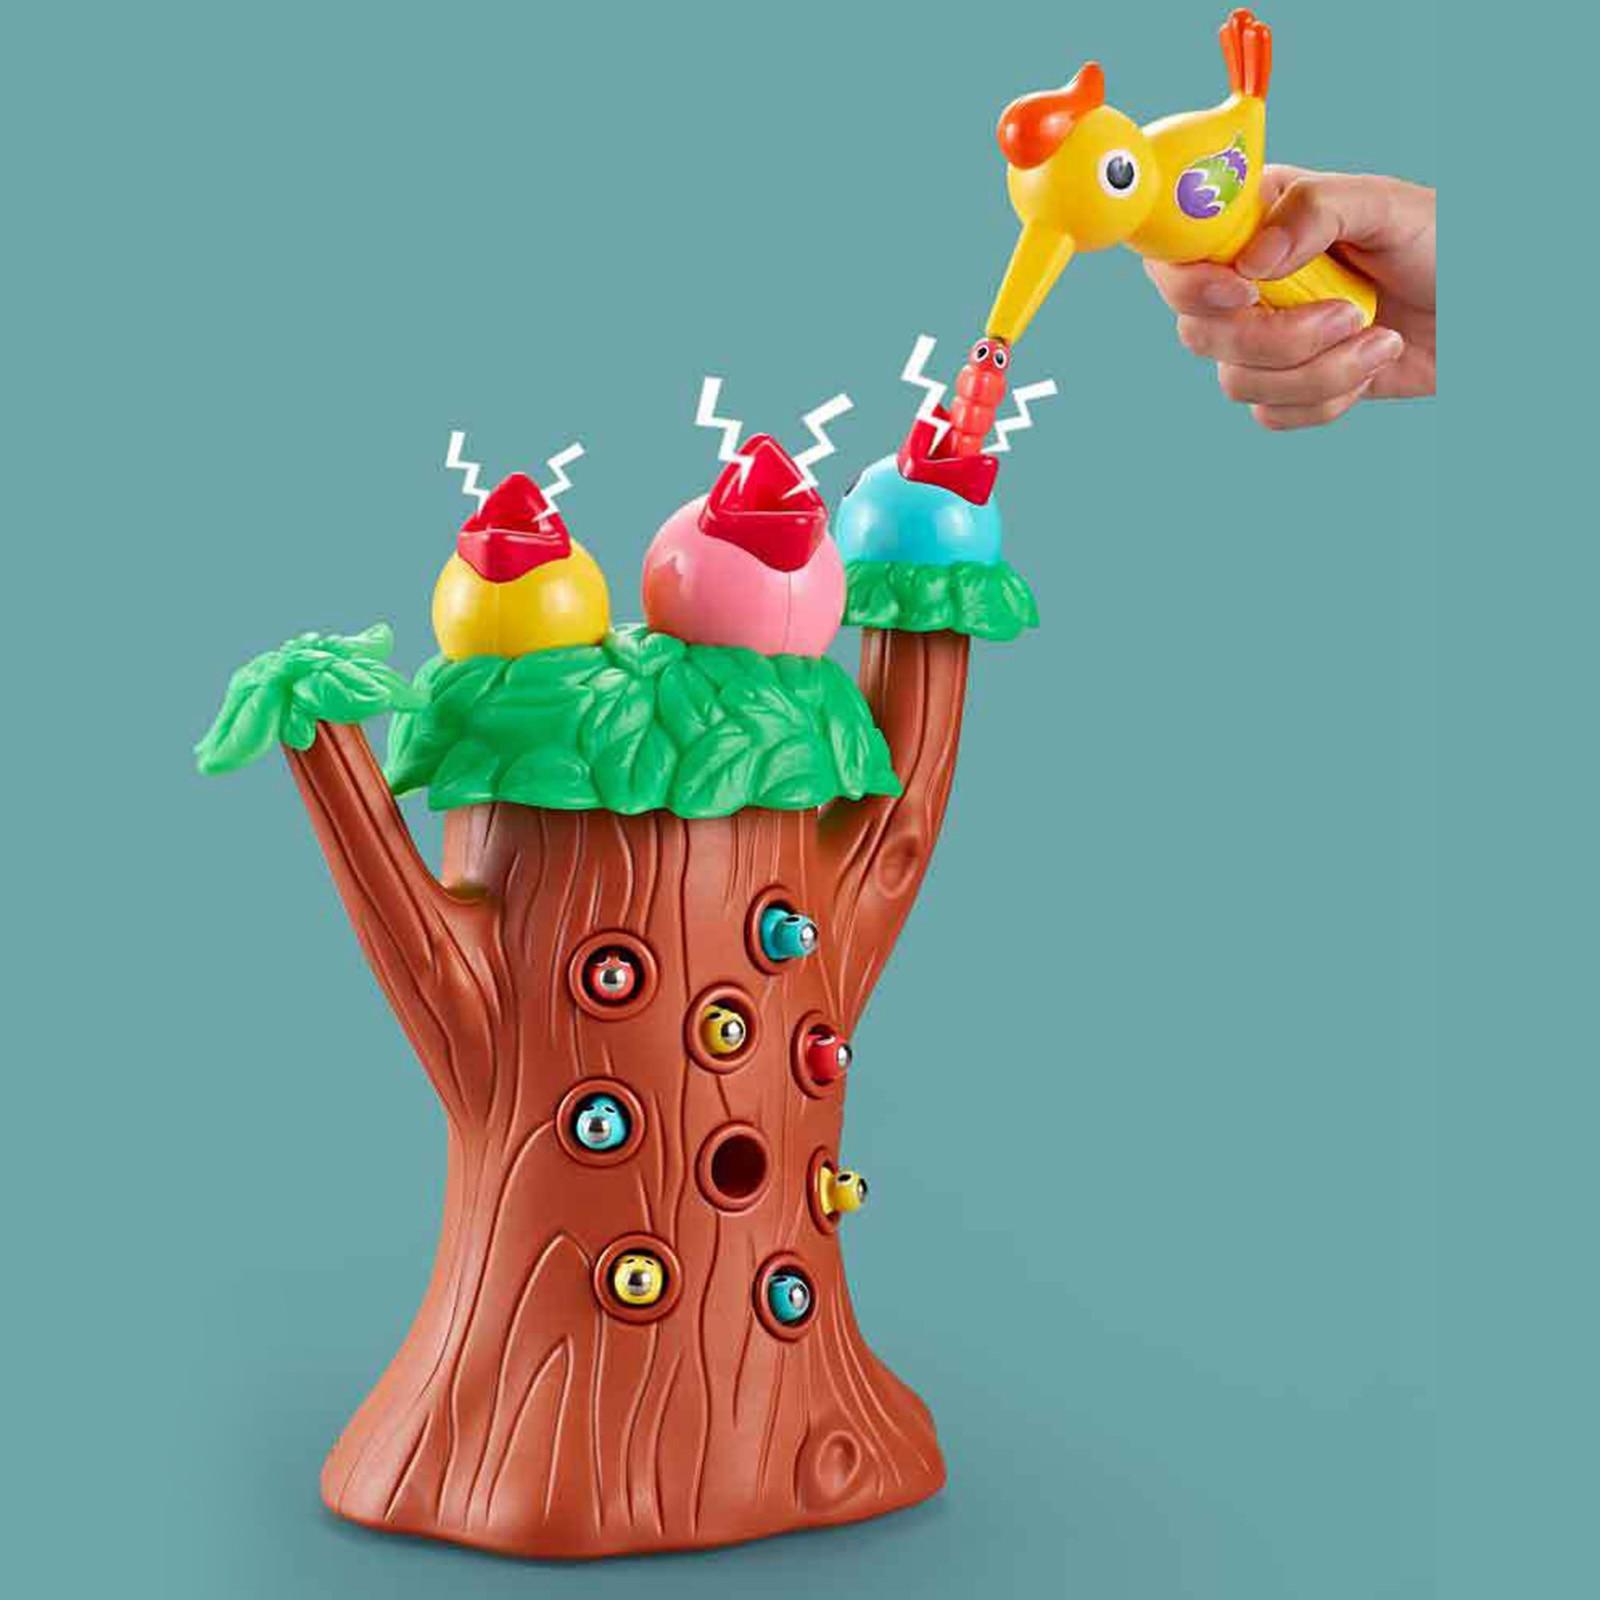 brinquedo peitoral magnetico para criancas habilidades fisicas 01